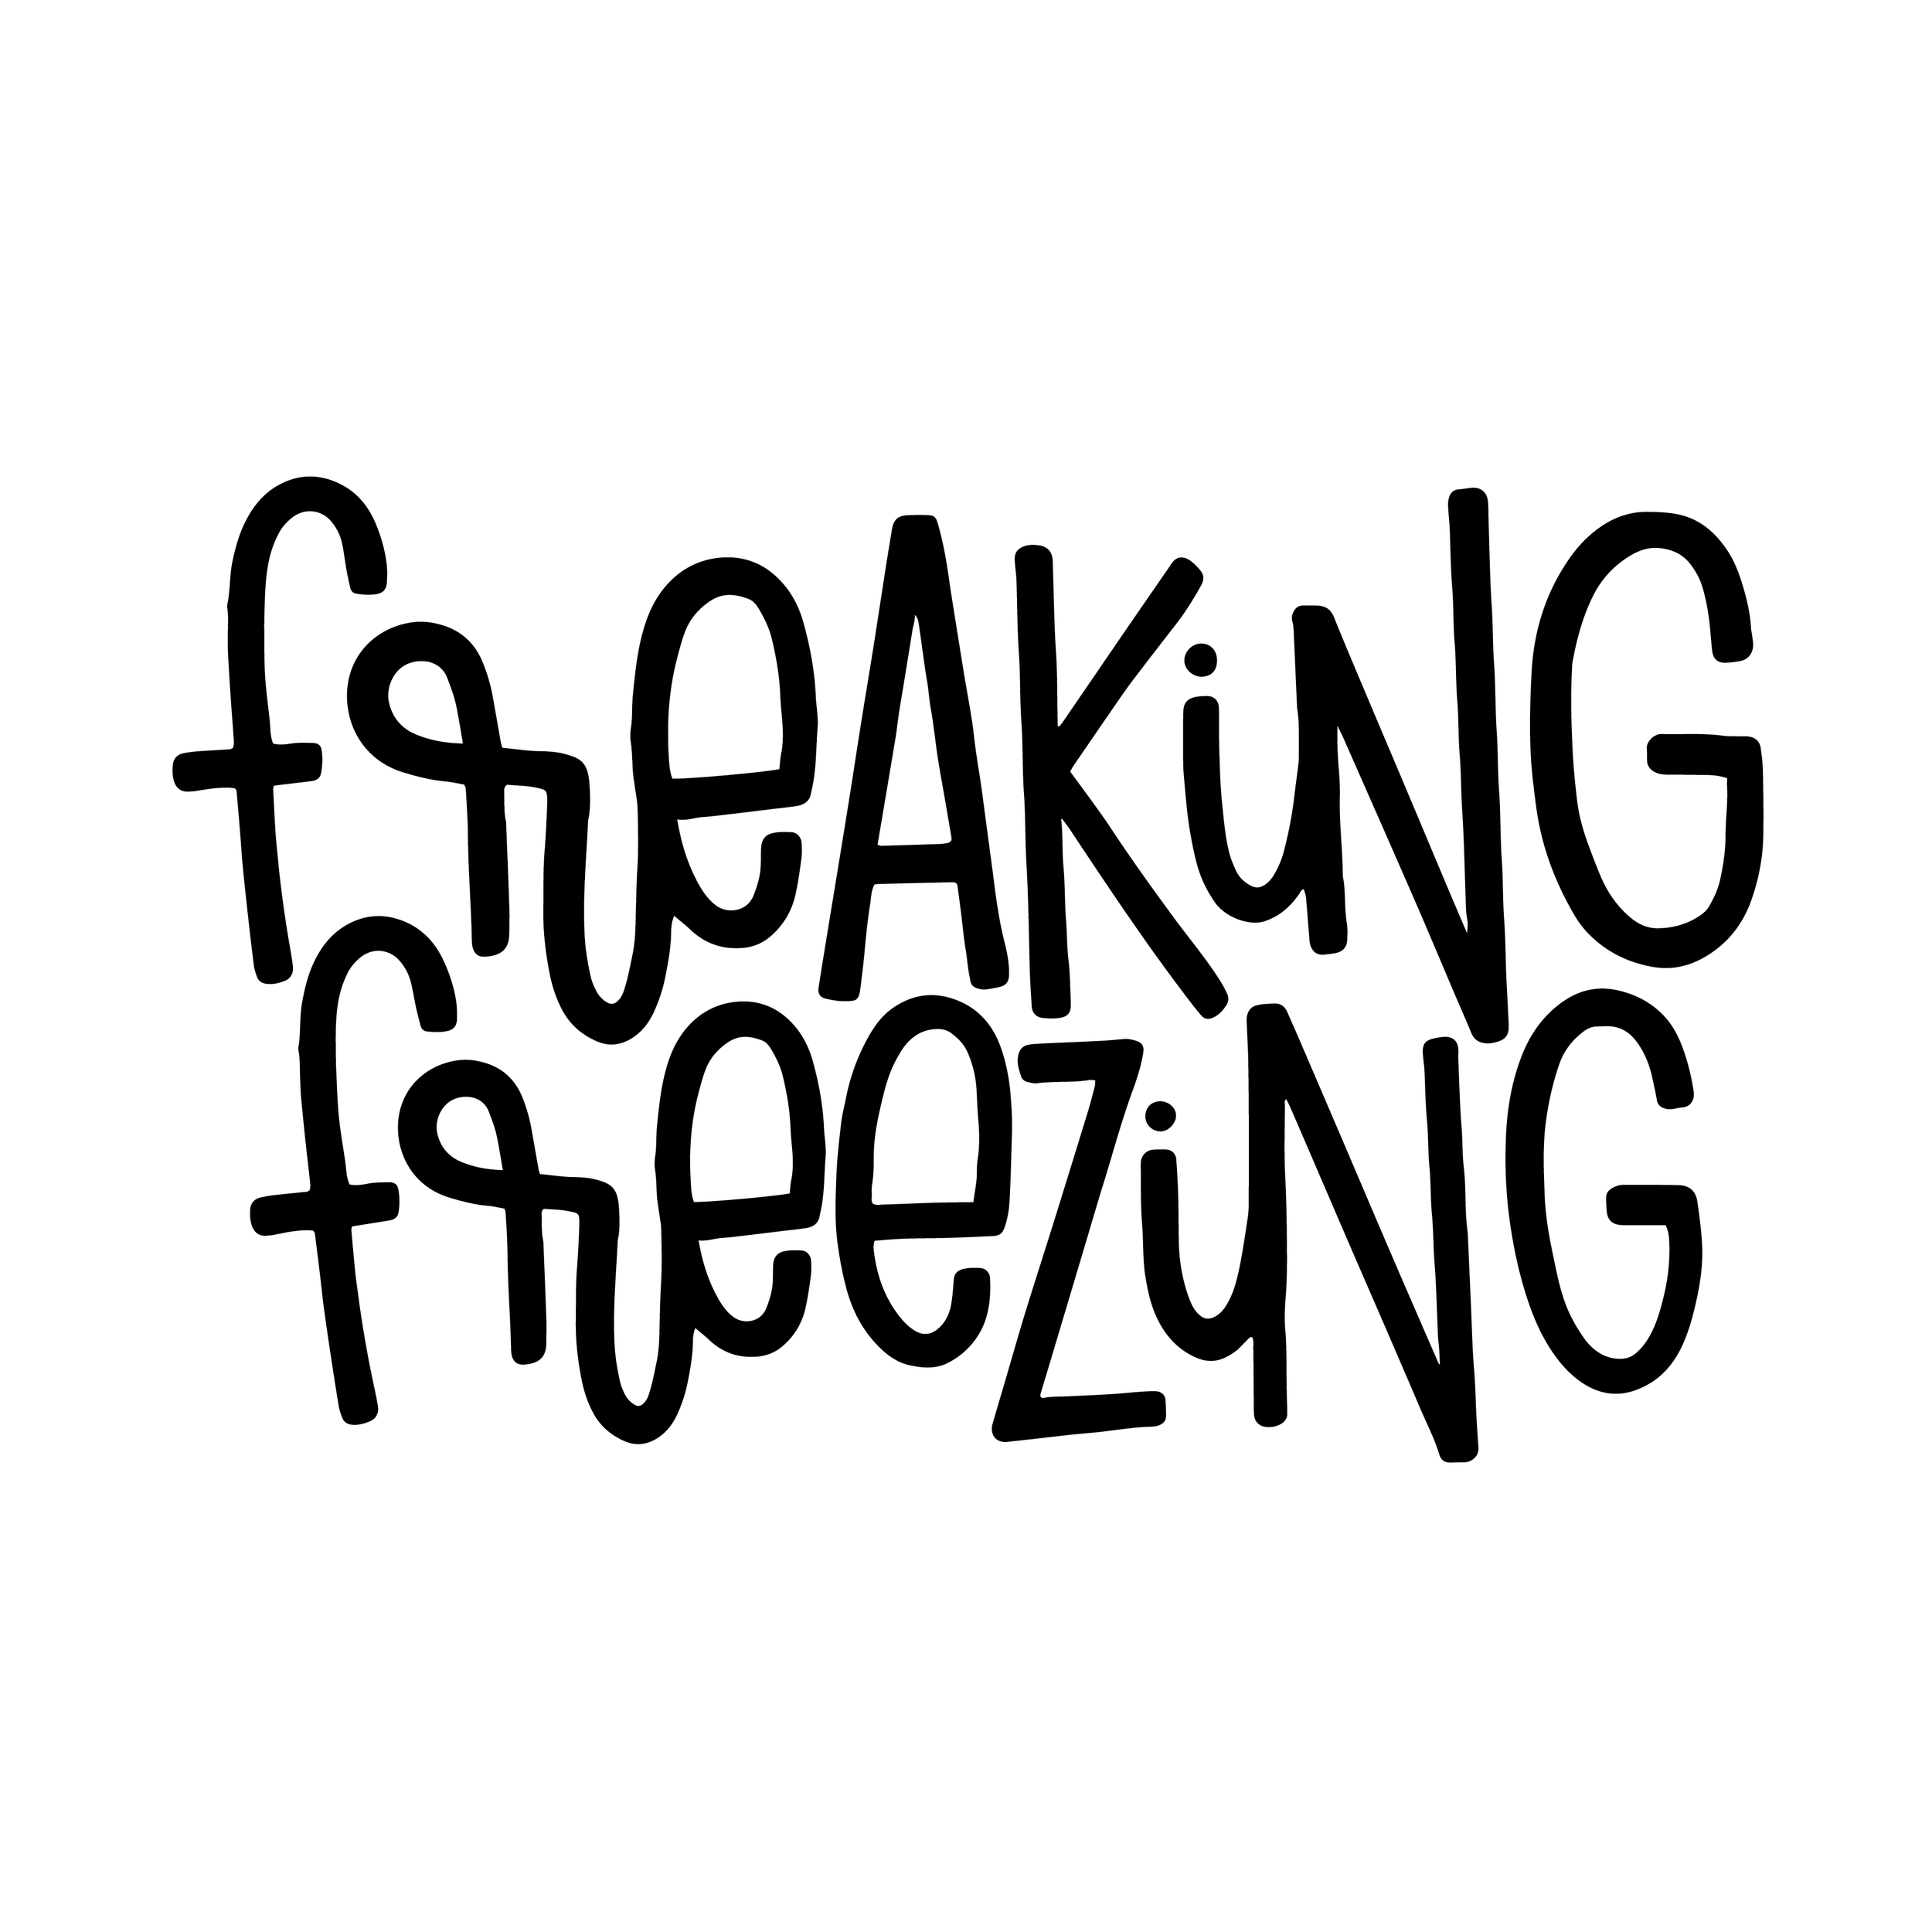 freezing-01.png